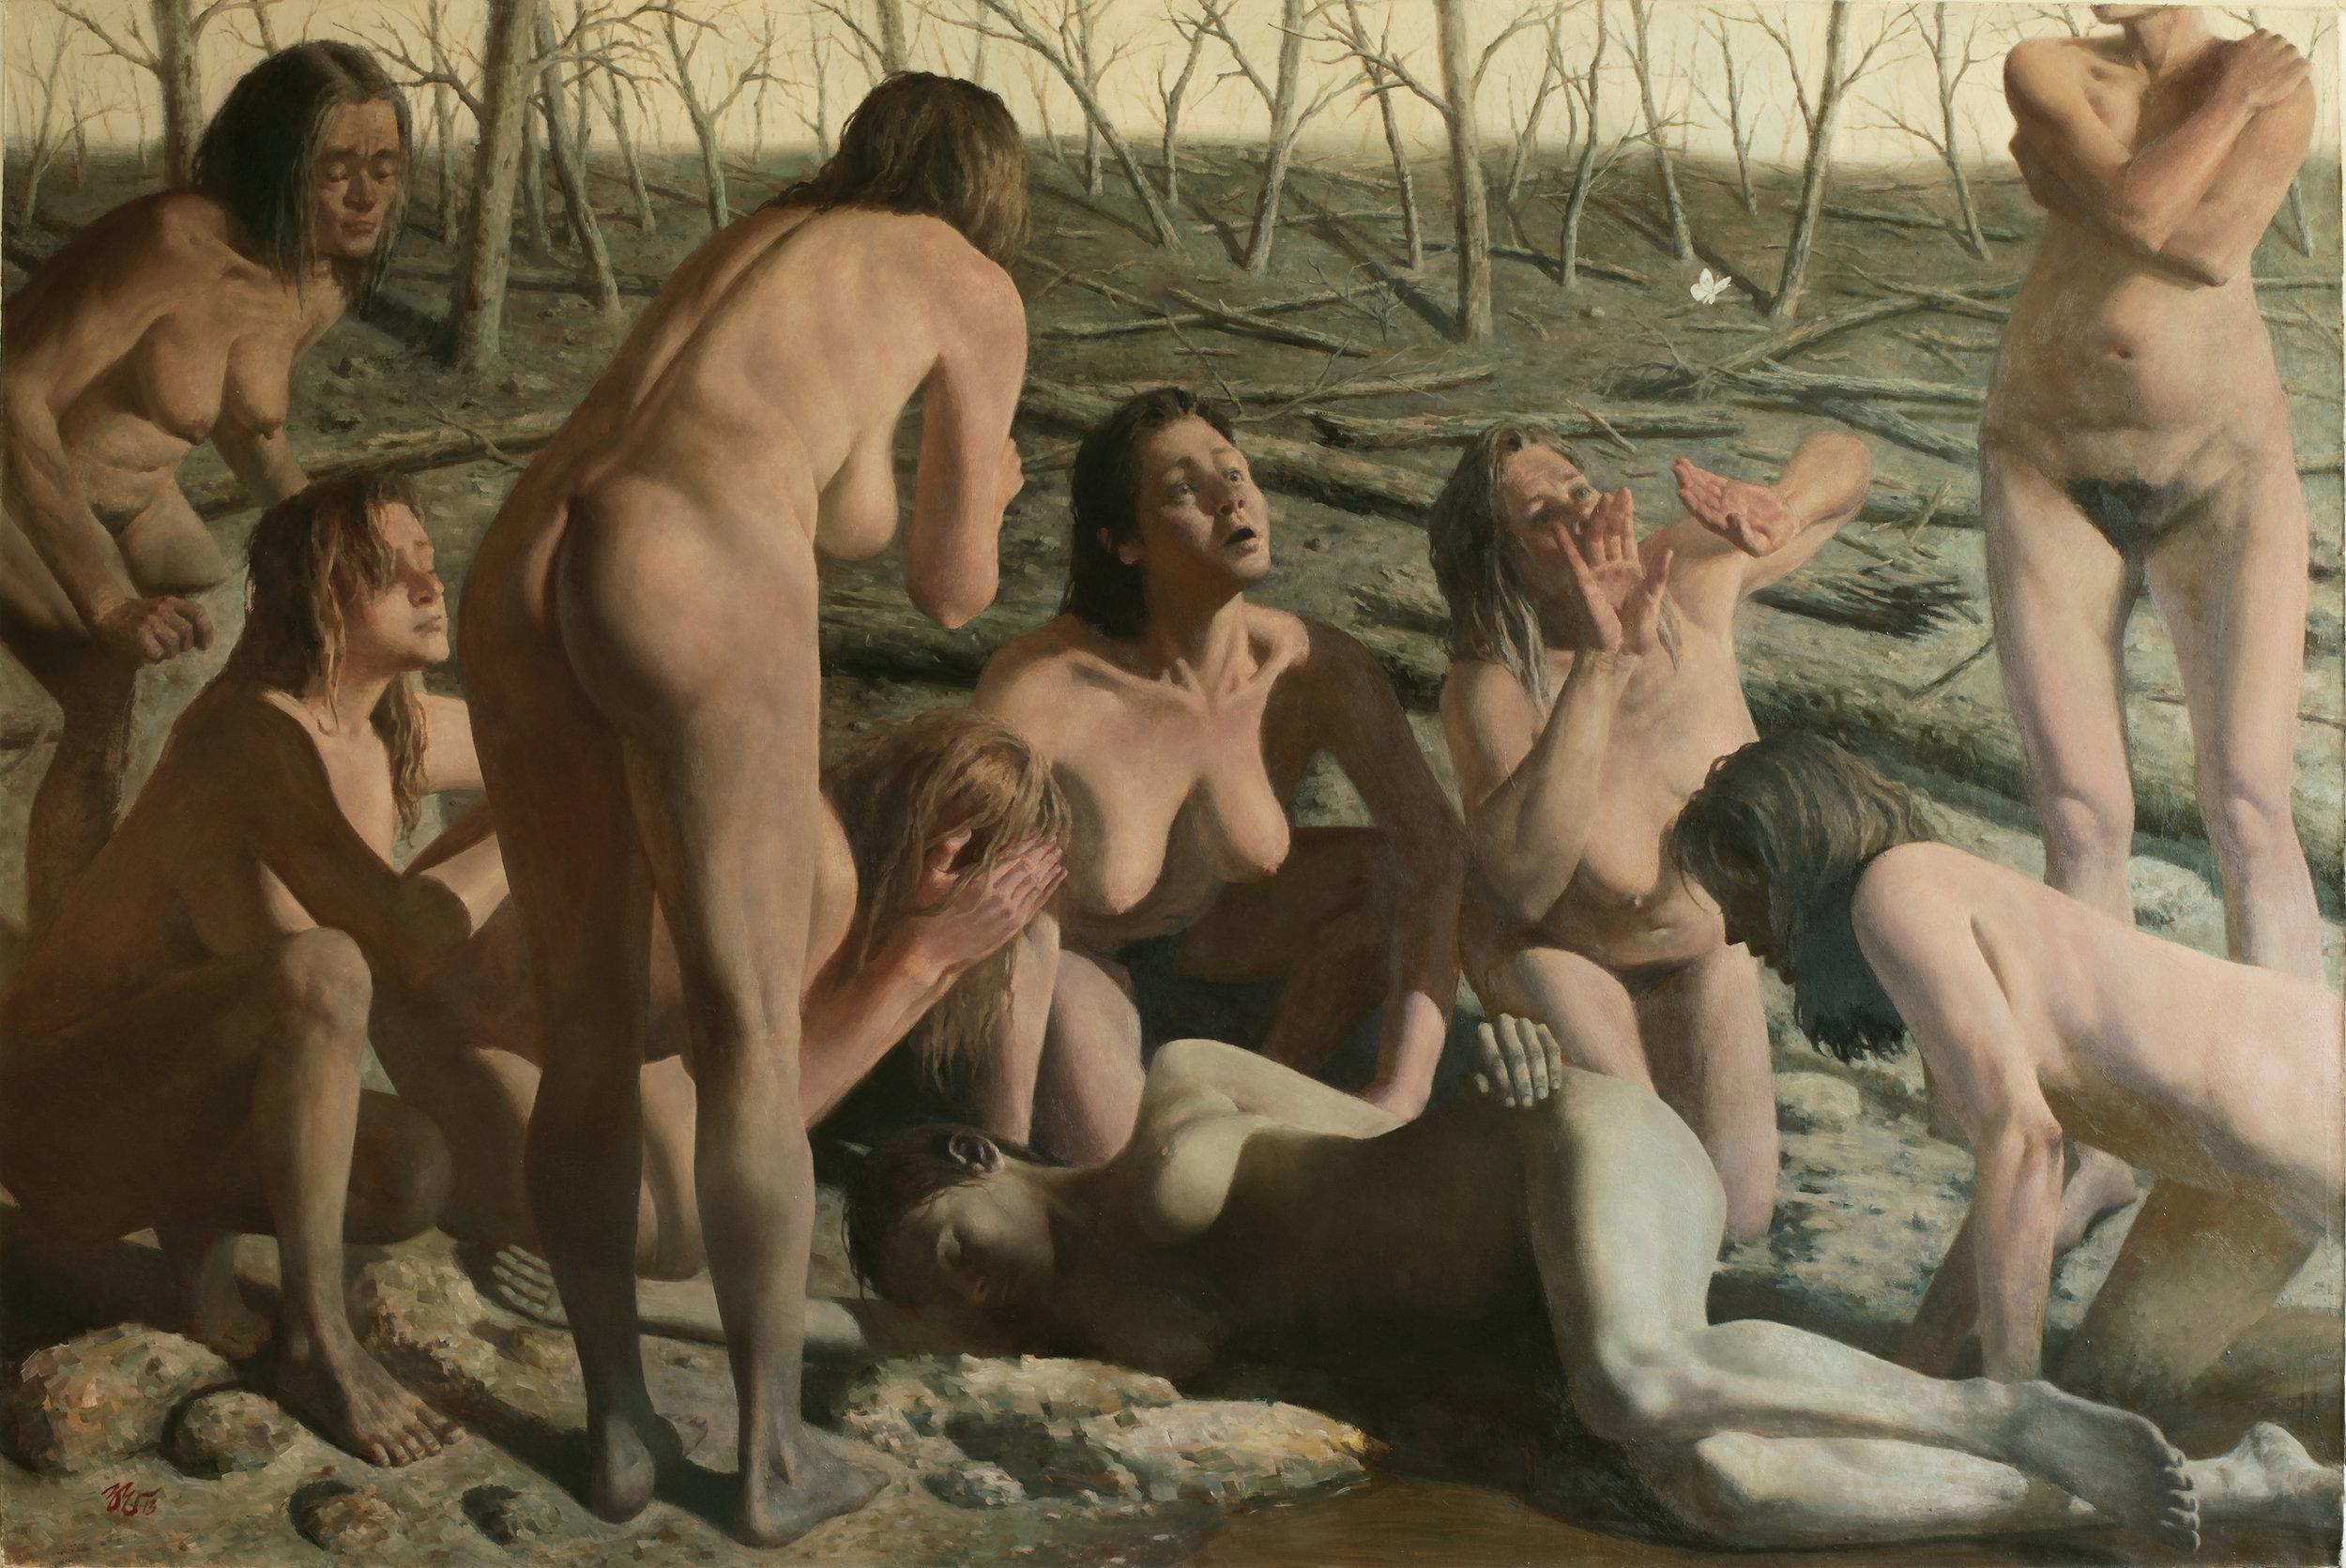 Zimou Tan Title: Relief Size: 48 x 72 x 2 Price: $65000 Medium: Oil